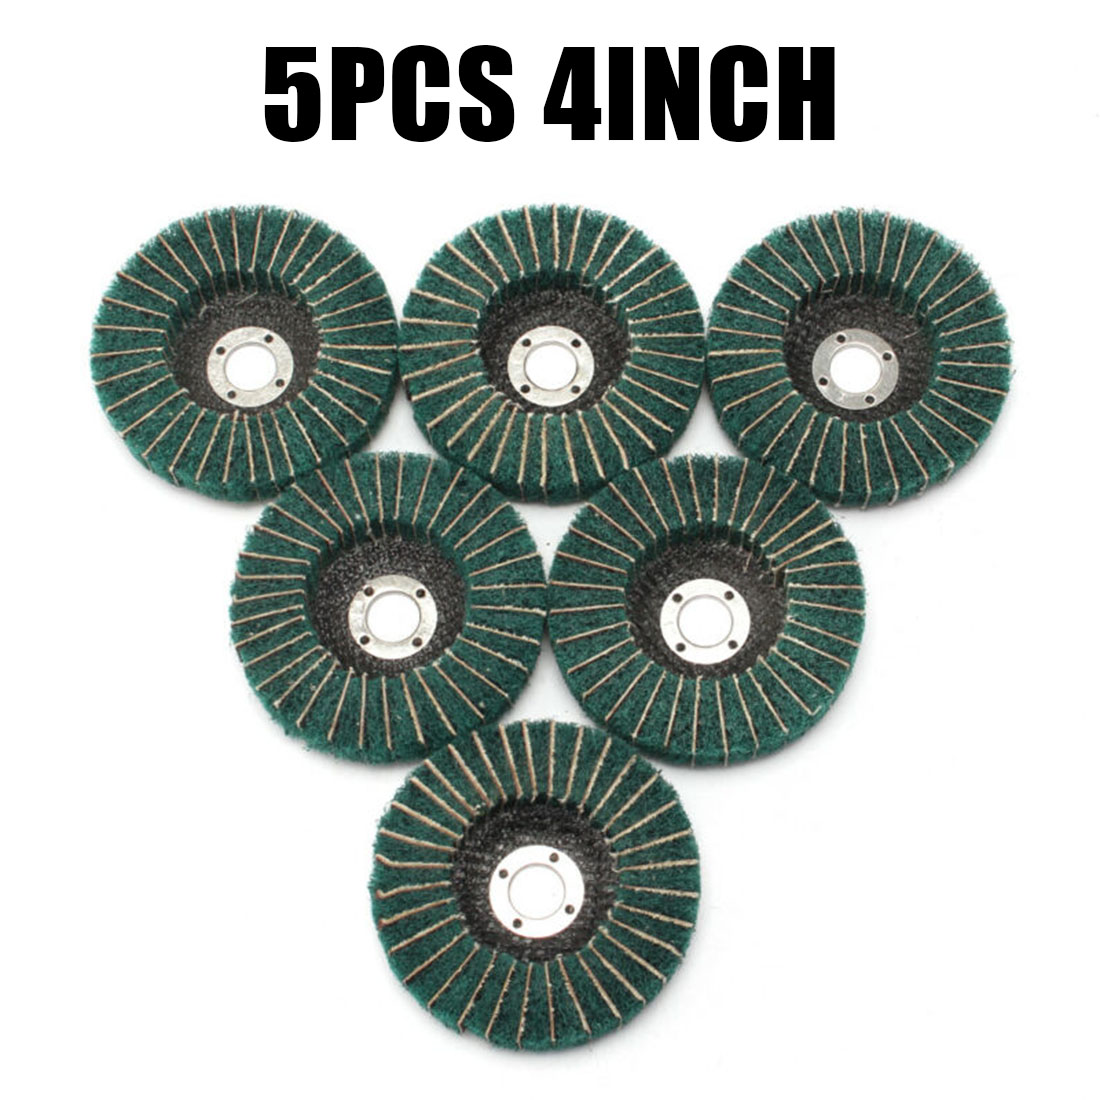 5Pcs Set 4inch Nylon Fiber Flap Wheel Disc 100mm Abrasive Polishing Buffing Pads With High Flexibility